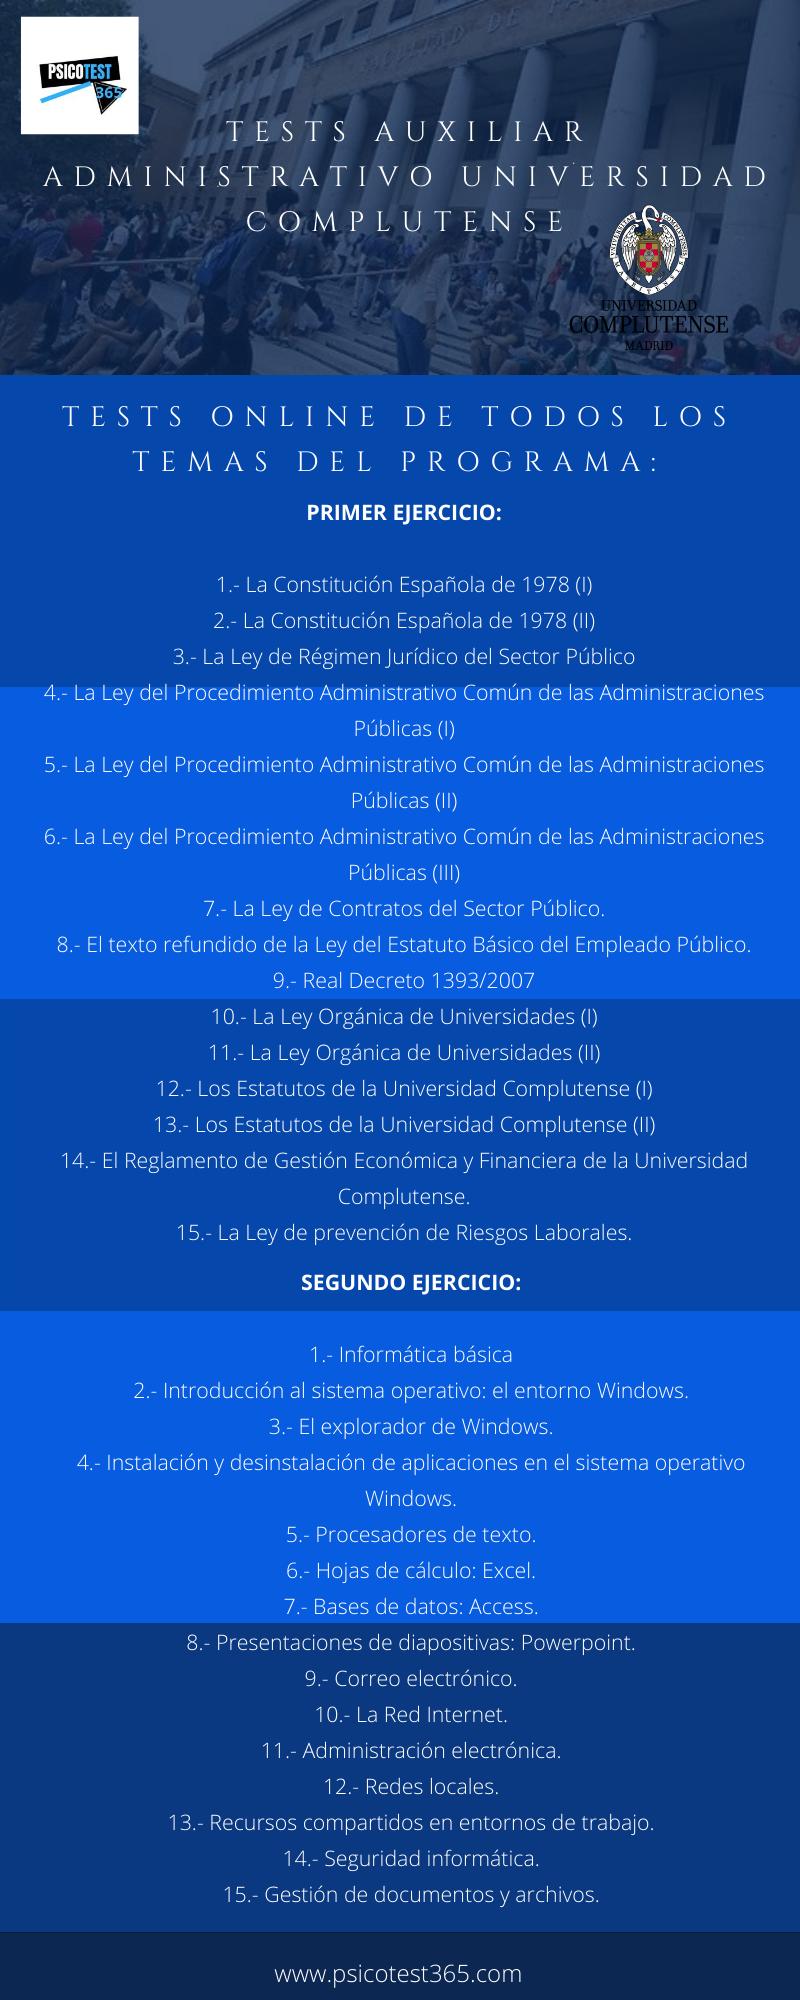 infografia tests auxiliares administrativos universidad complutense